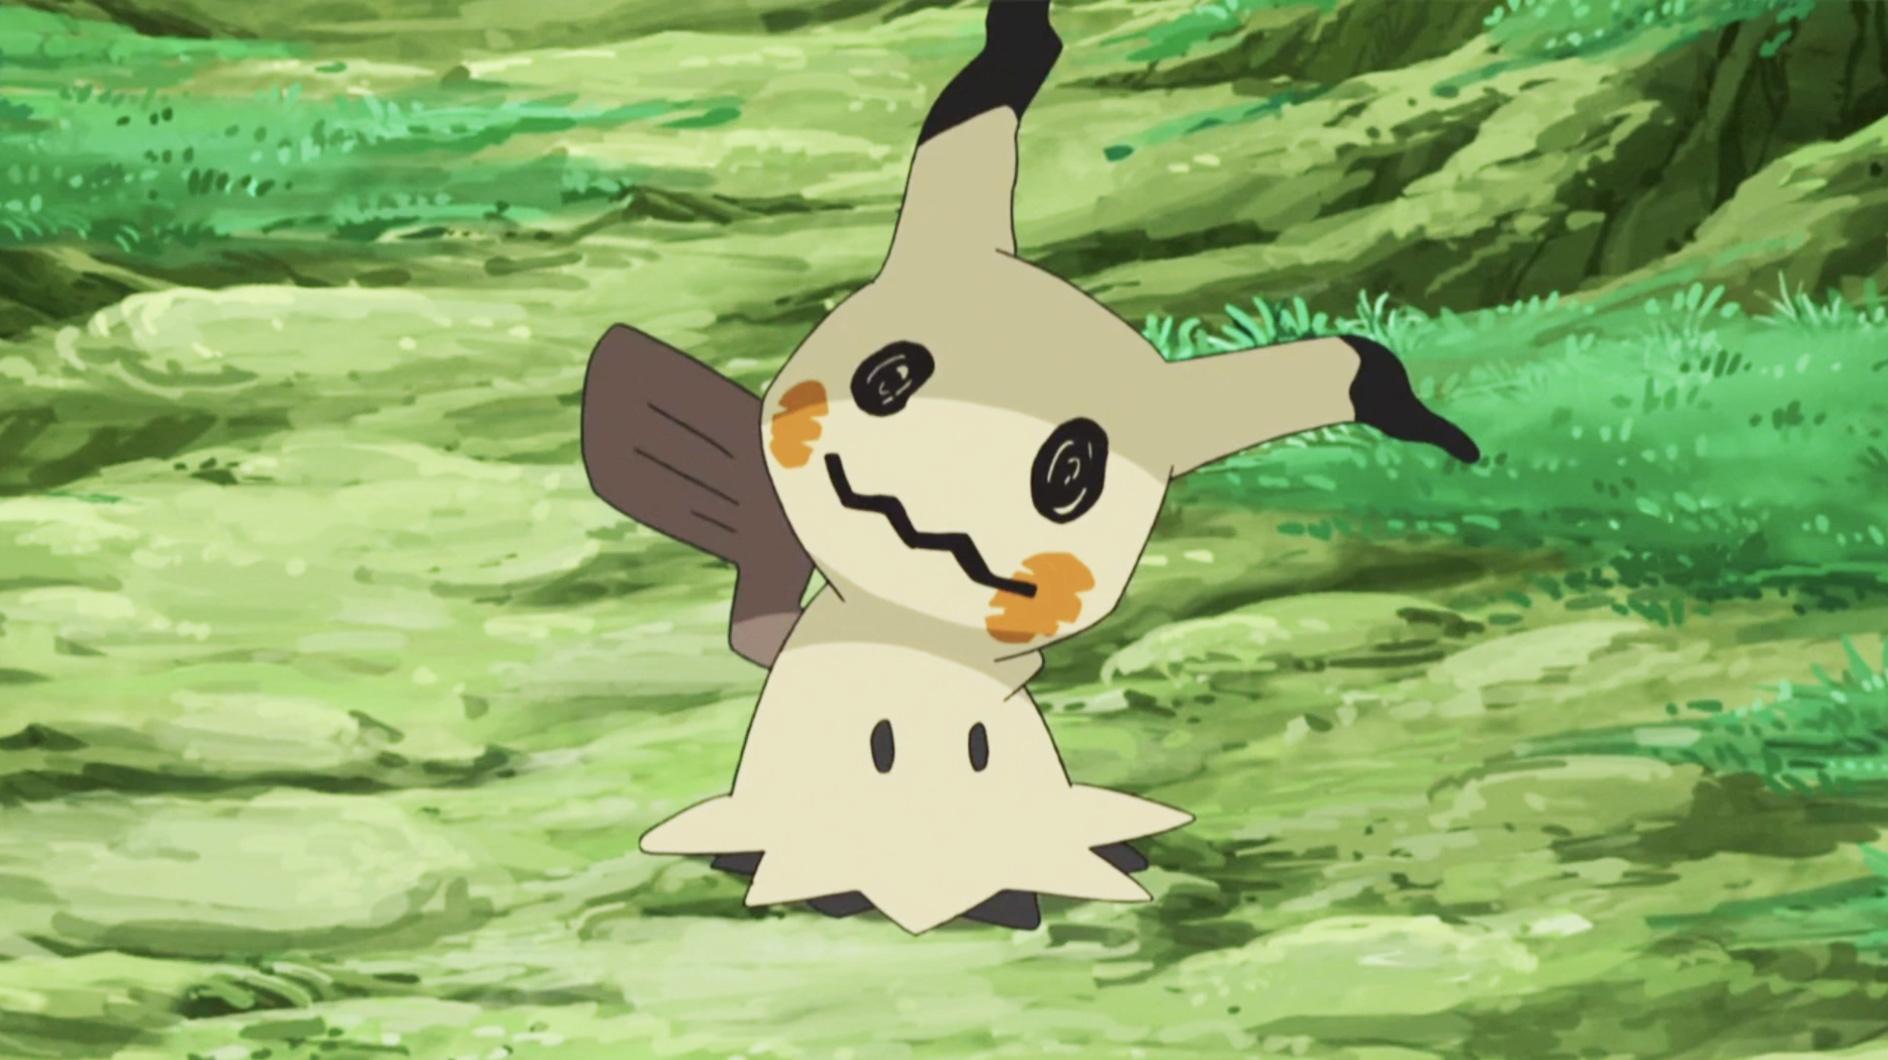 Screenshot of Pokemon Mimikyu from Sun & Moon anime.